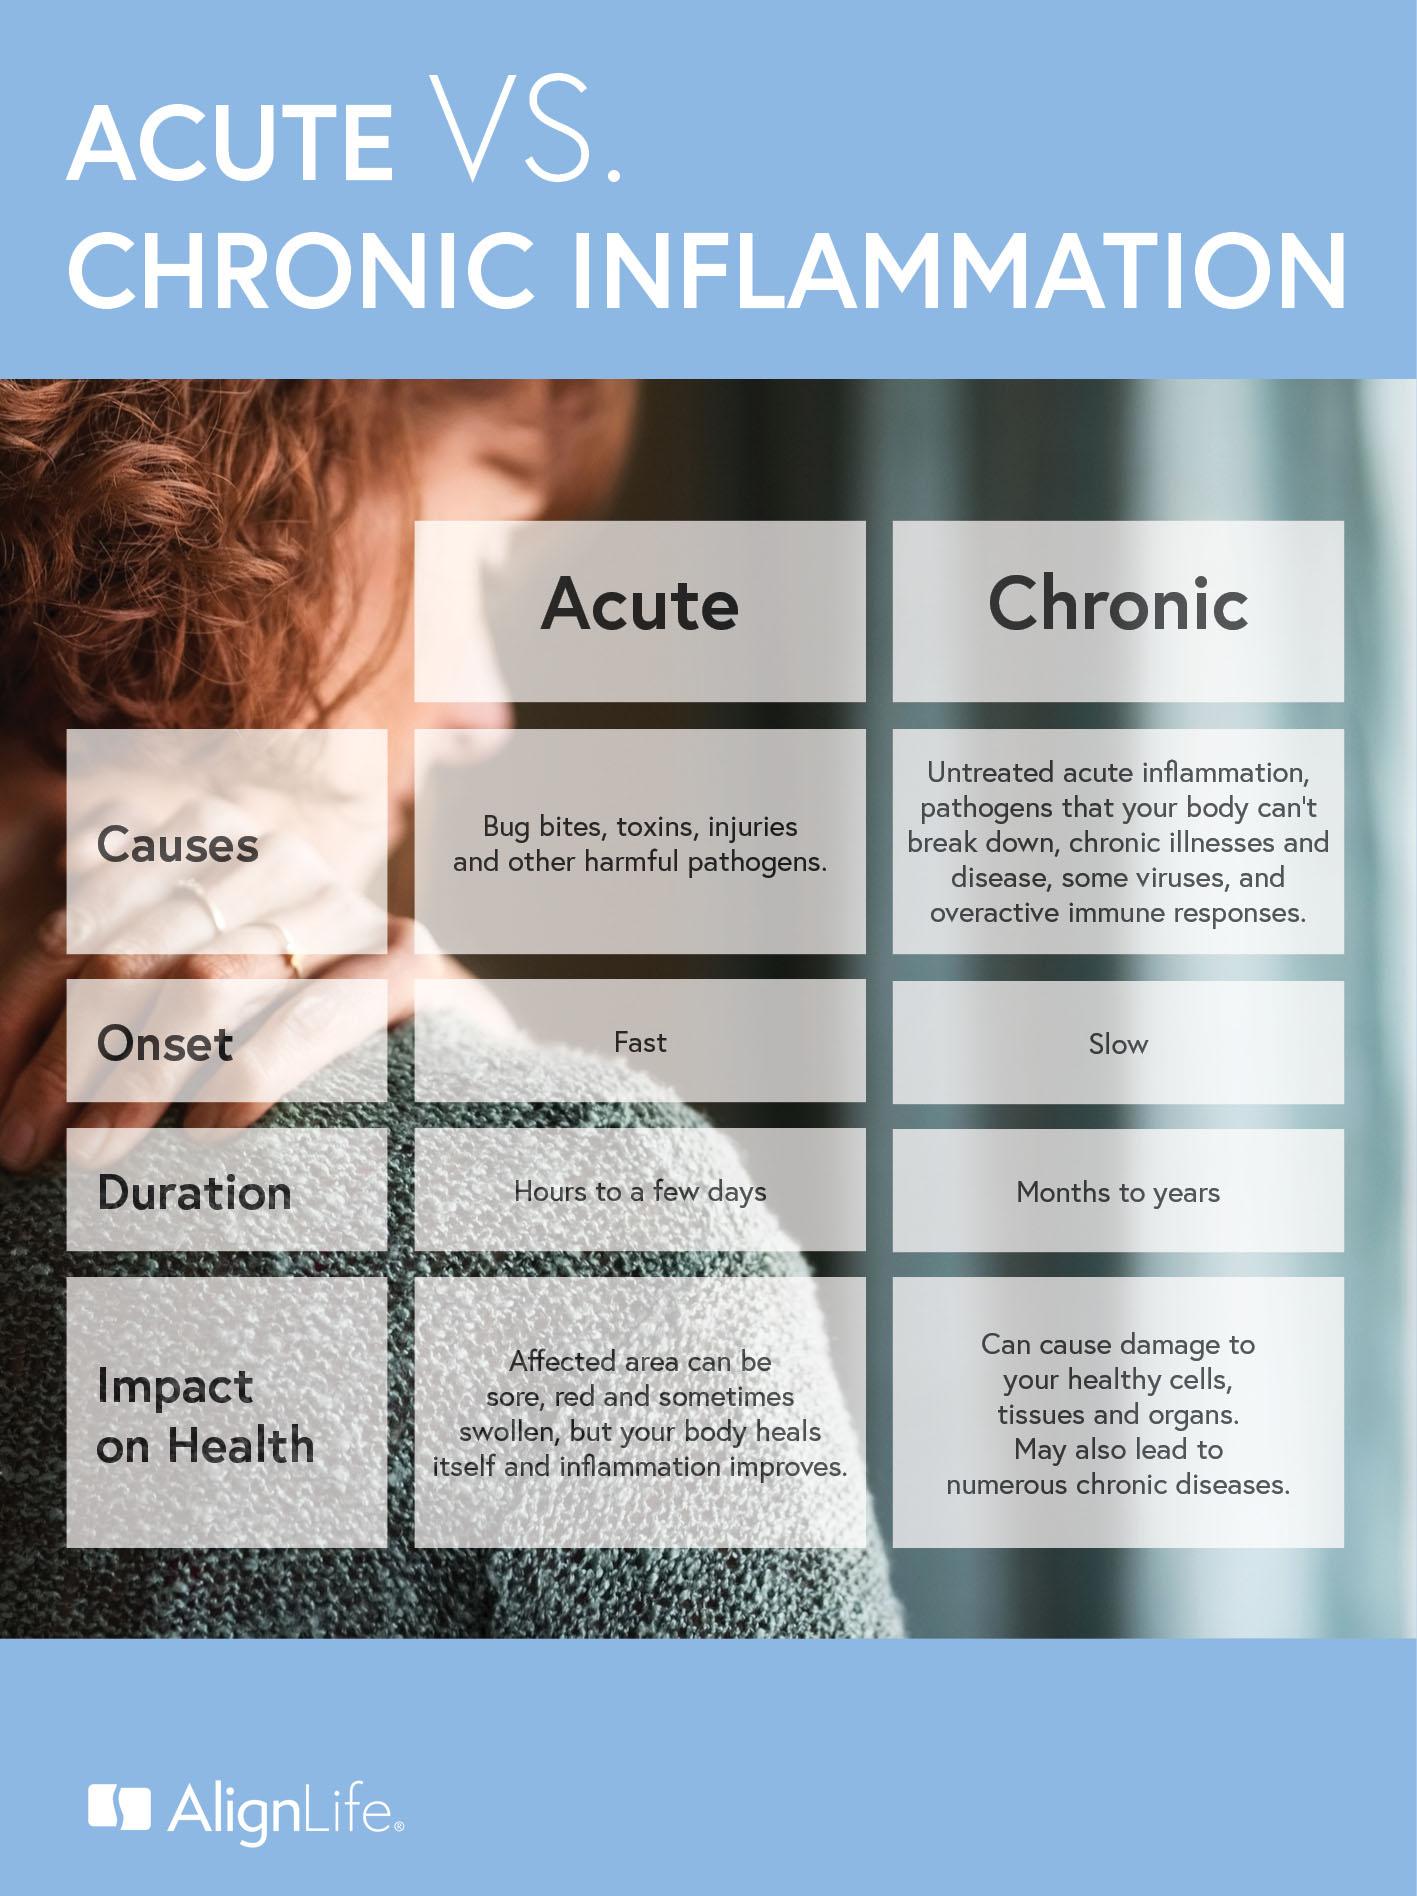 acute vs chronic inflammation - alignlife.com